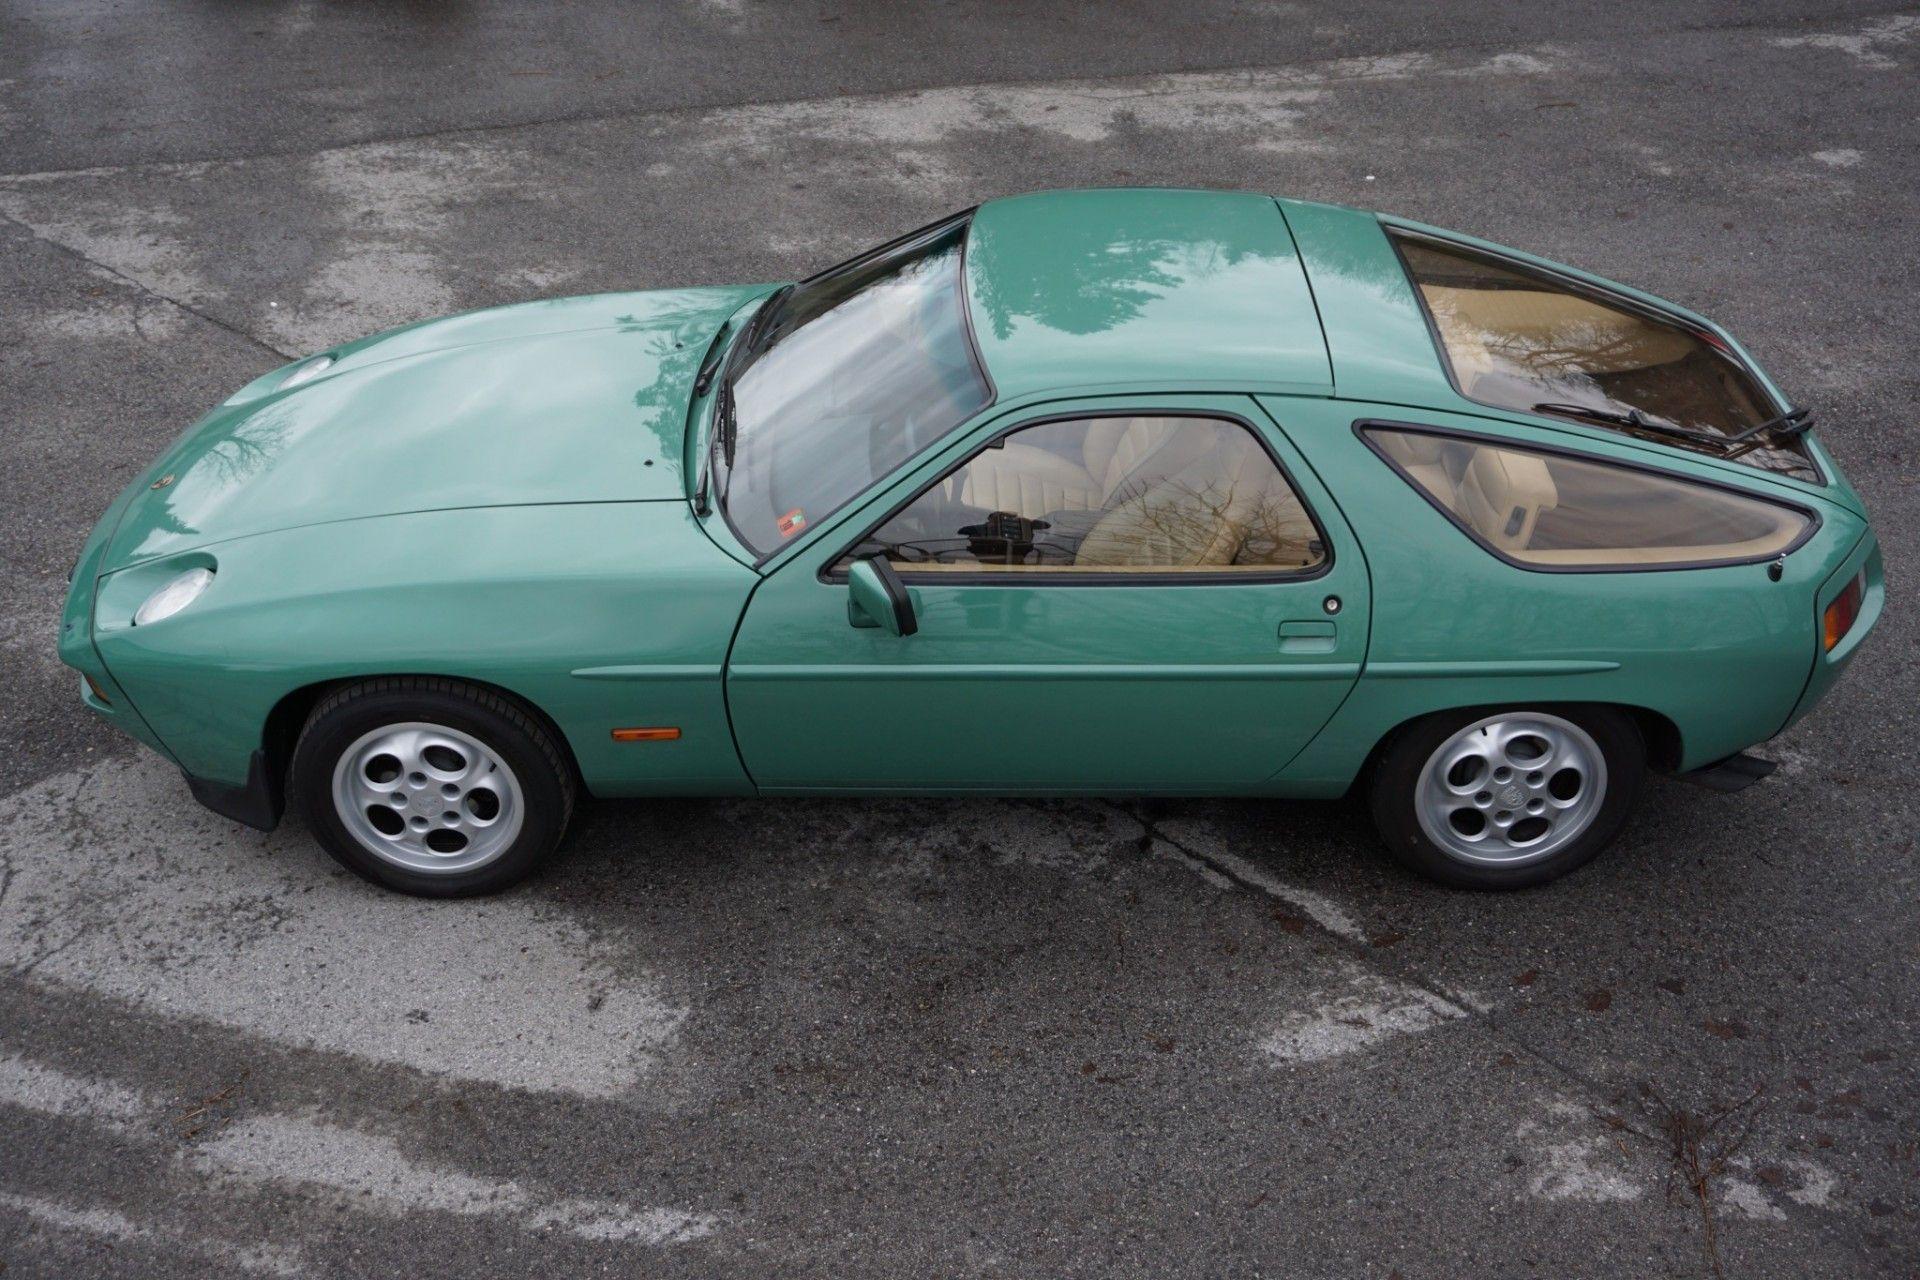 Porsche 928 1982 Elferspot Com Marketplace For Porsche Sports Cars In 2021 Porsche 928 Porsche Sports Car Porsche